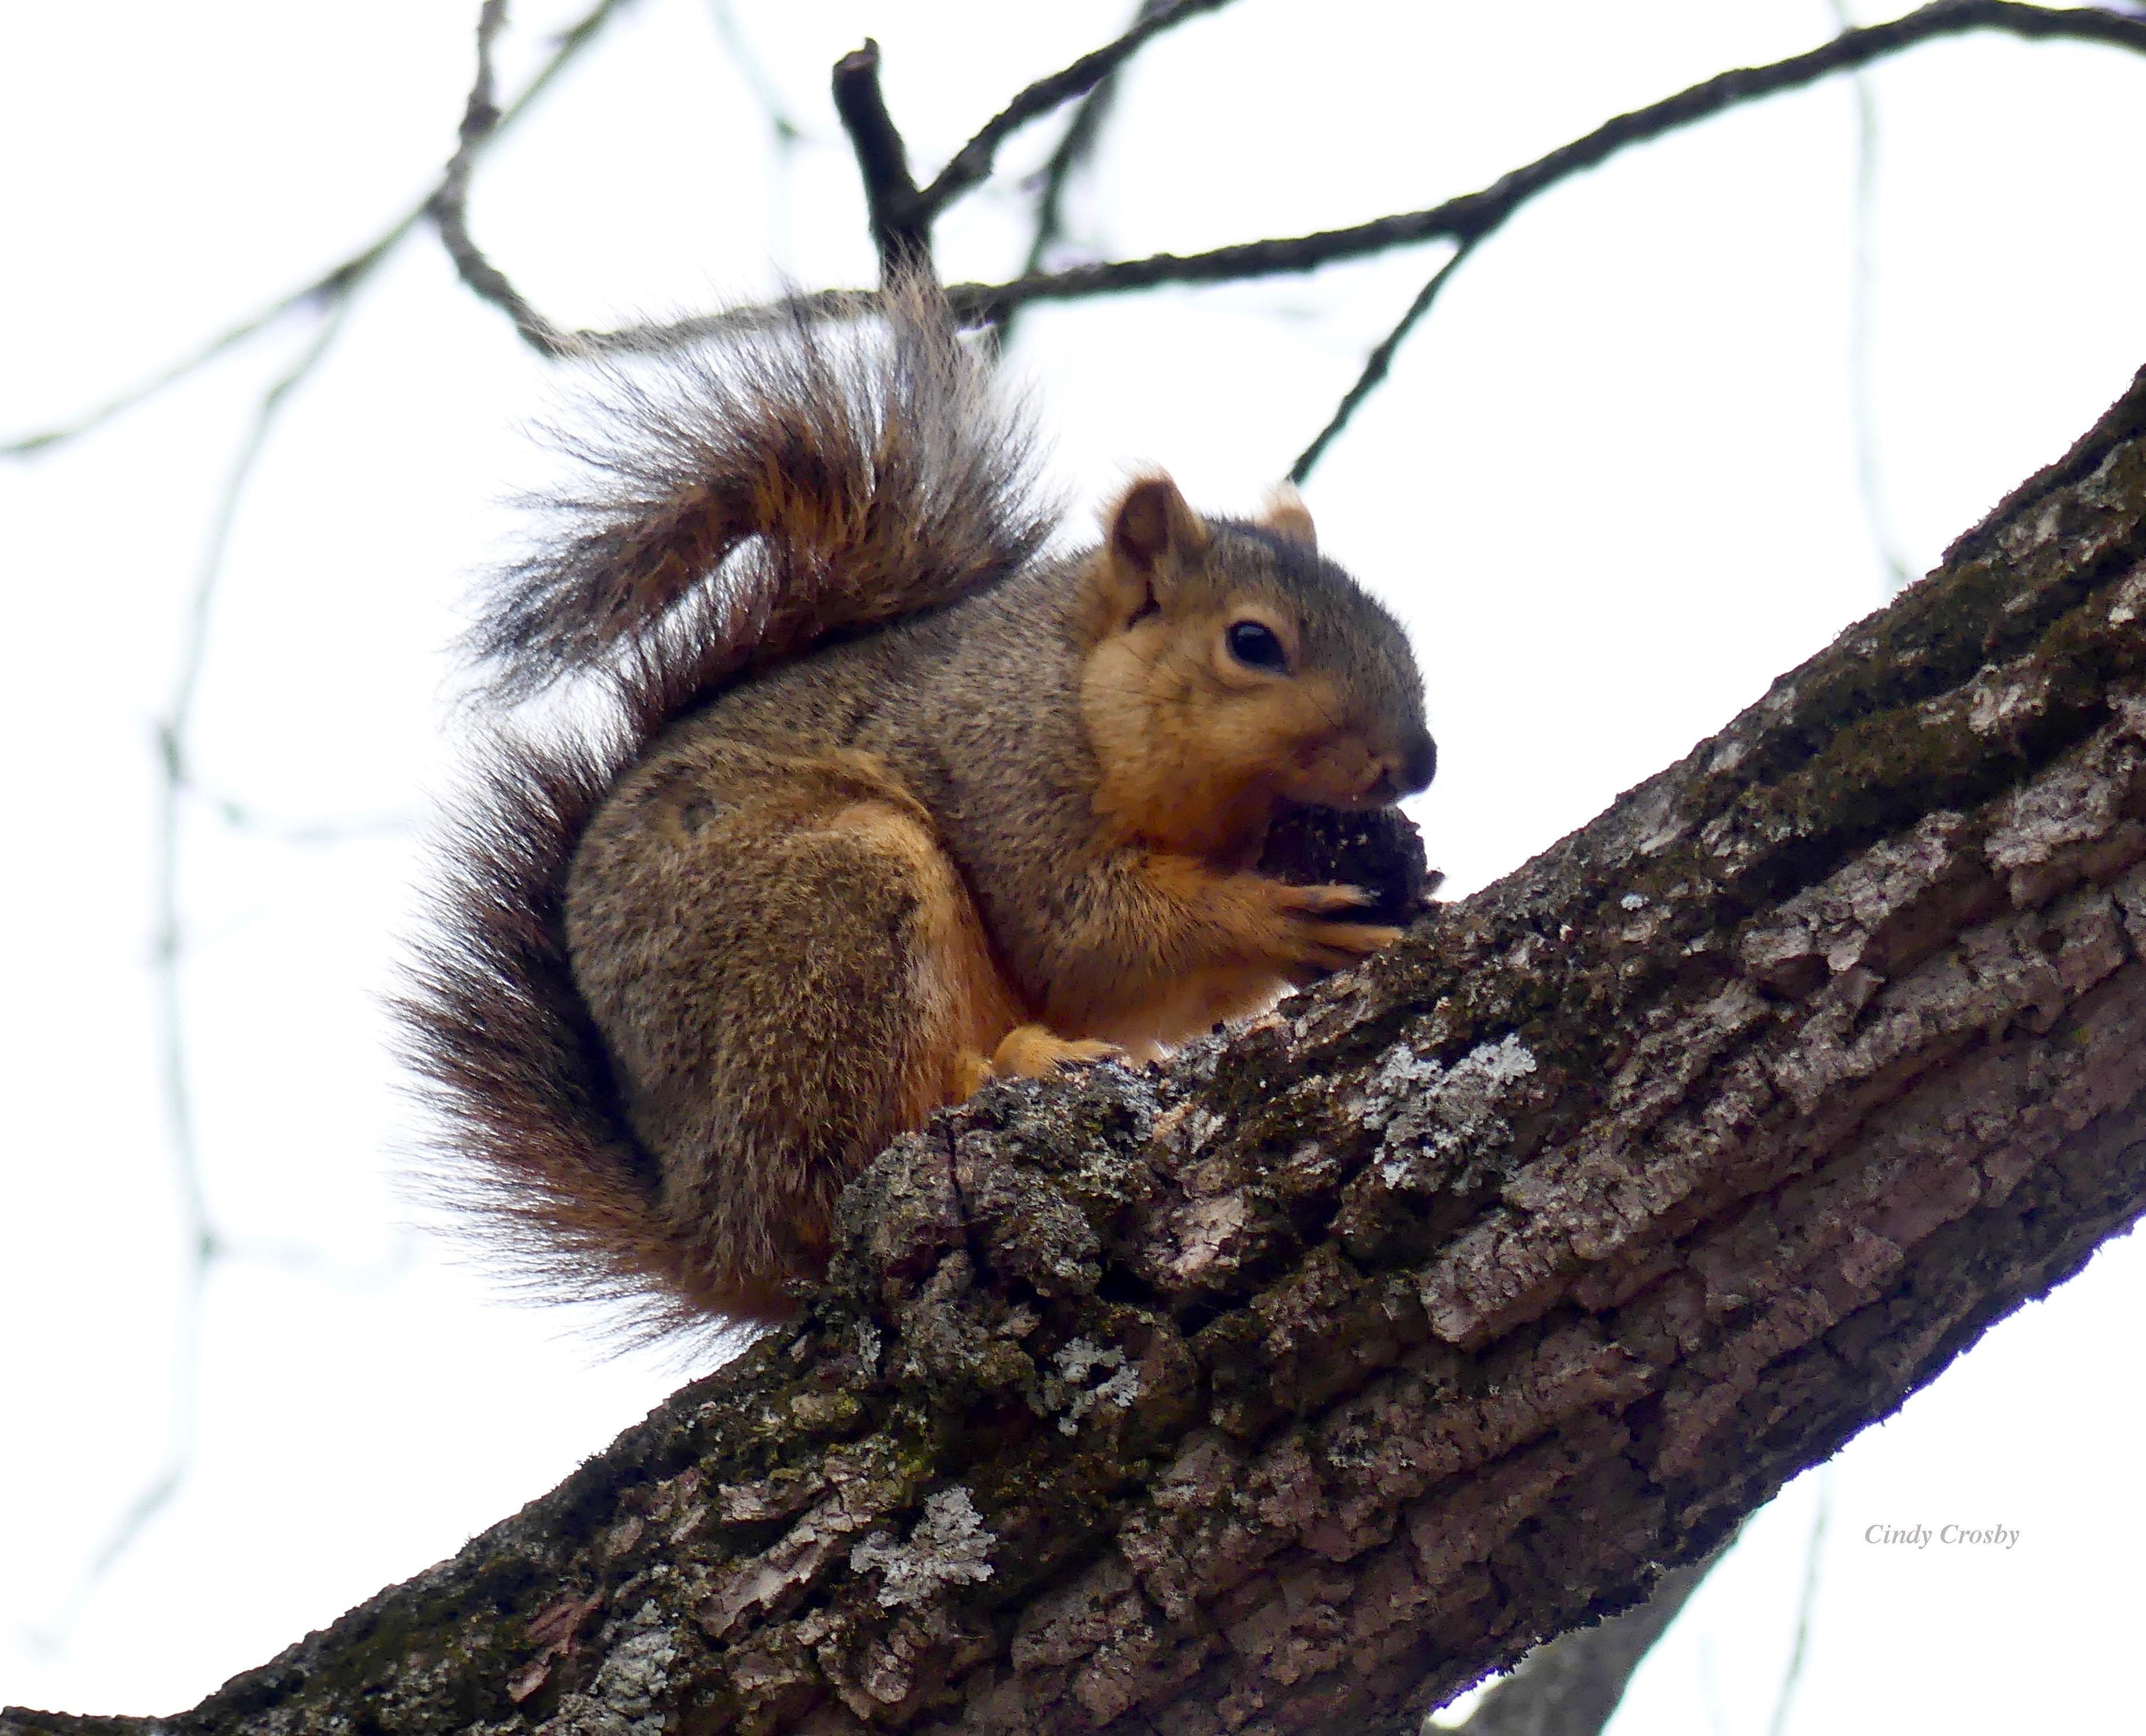 squirrelgnawingnutSPMA1520WM.jpg